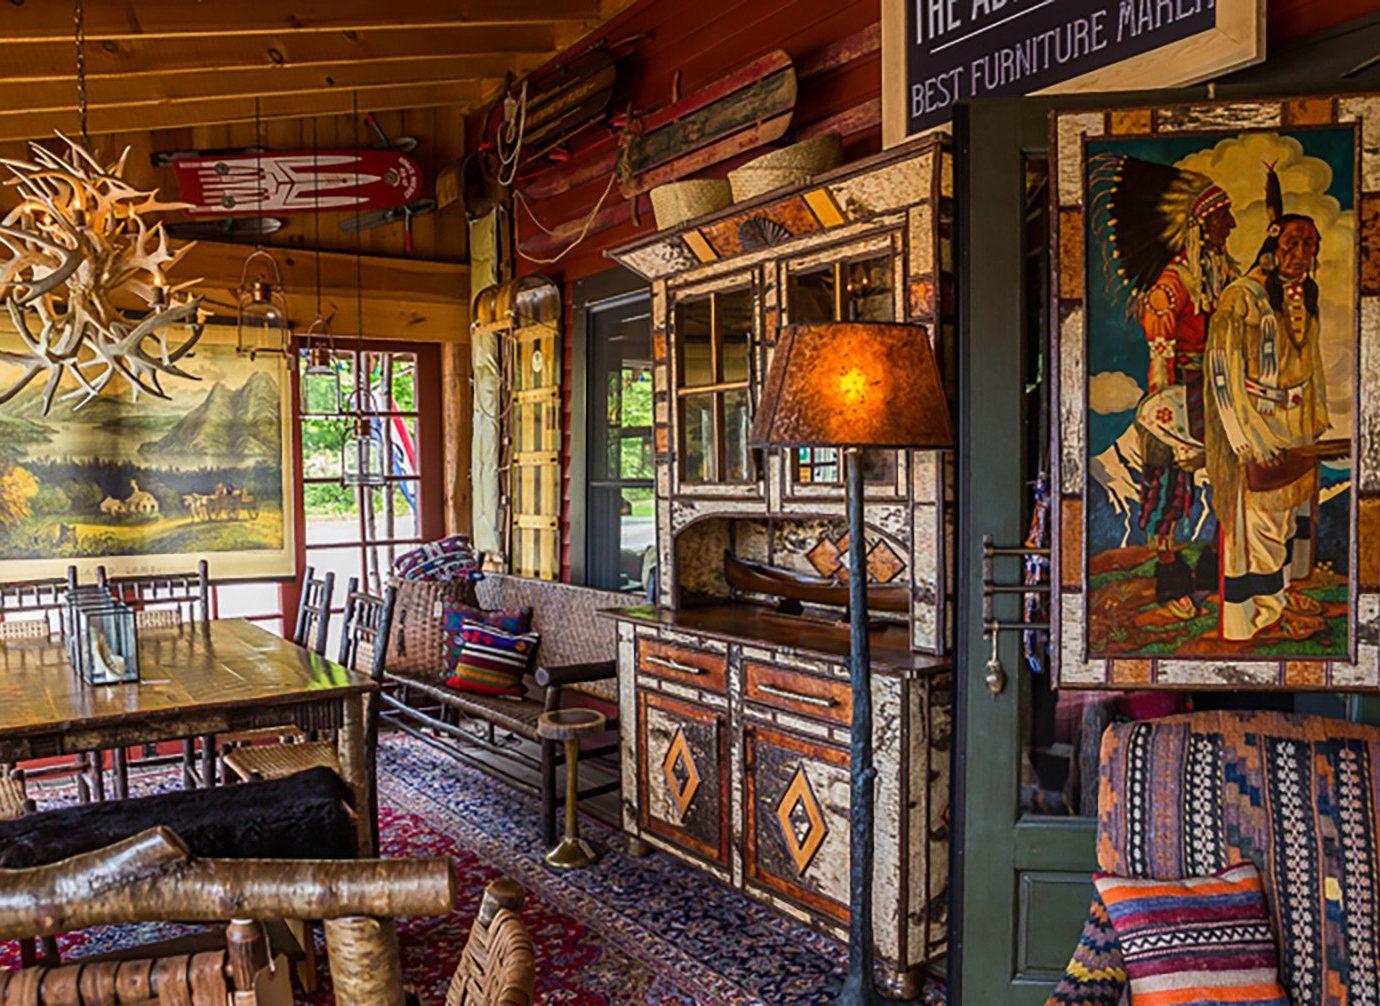 Boutique Hotels Hotels Outdoors + Adventure Trip Ideas Weekend Getaways window interior design